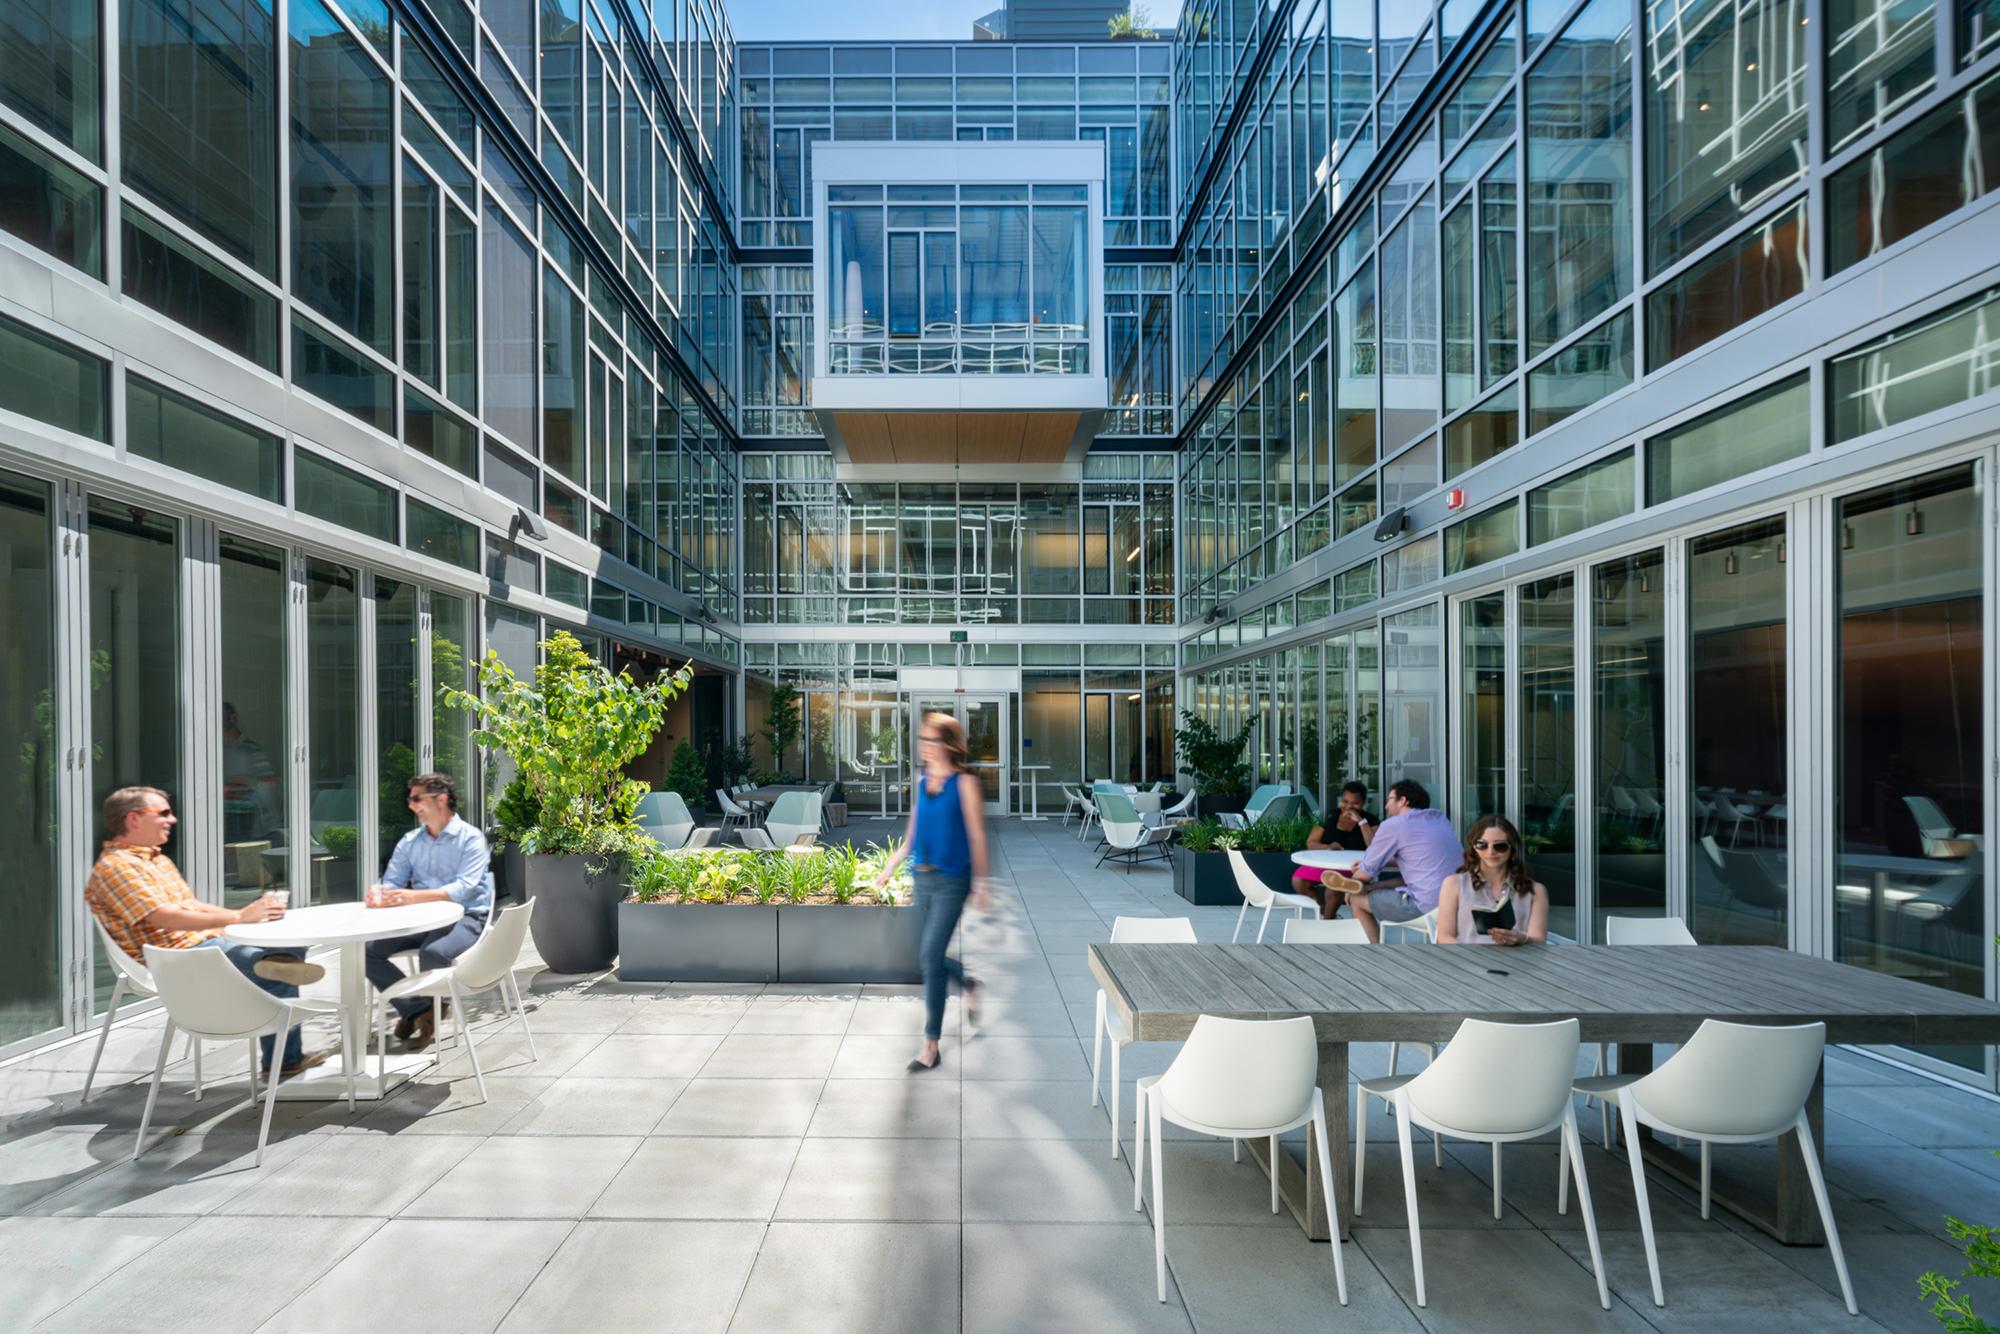 Data 1 Courtyard at day